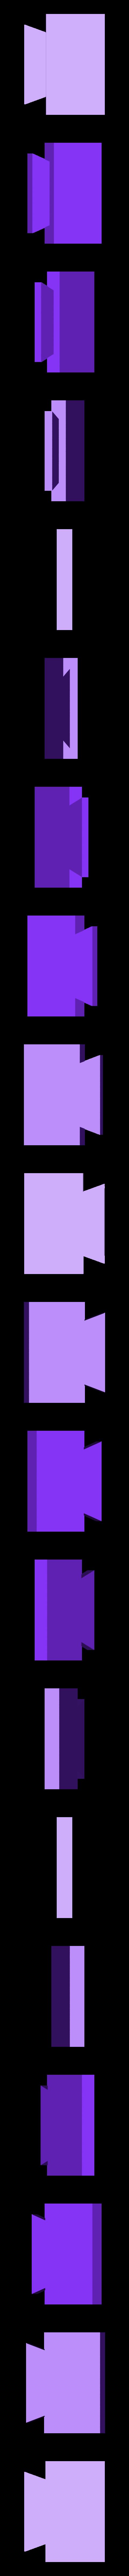 edge_white.STL Download free STL file SNAP fit chess/game board • 3D printer object, juglaz